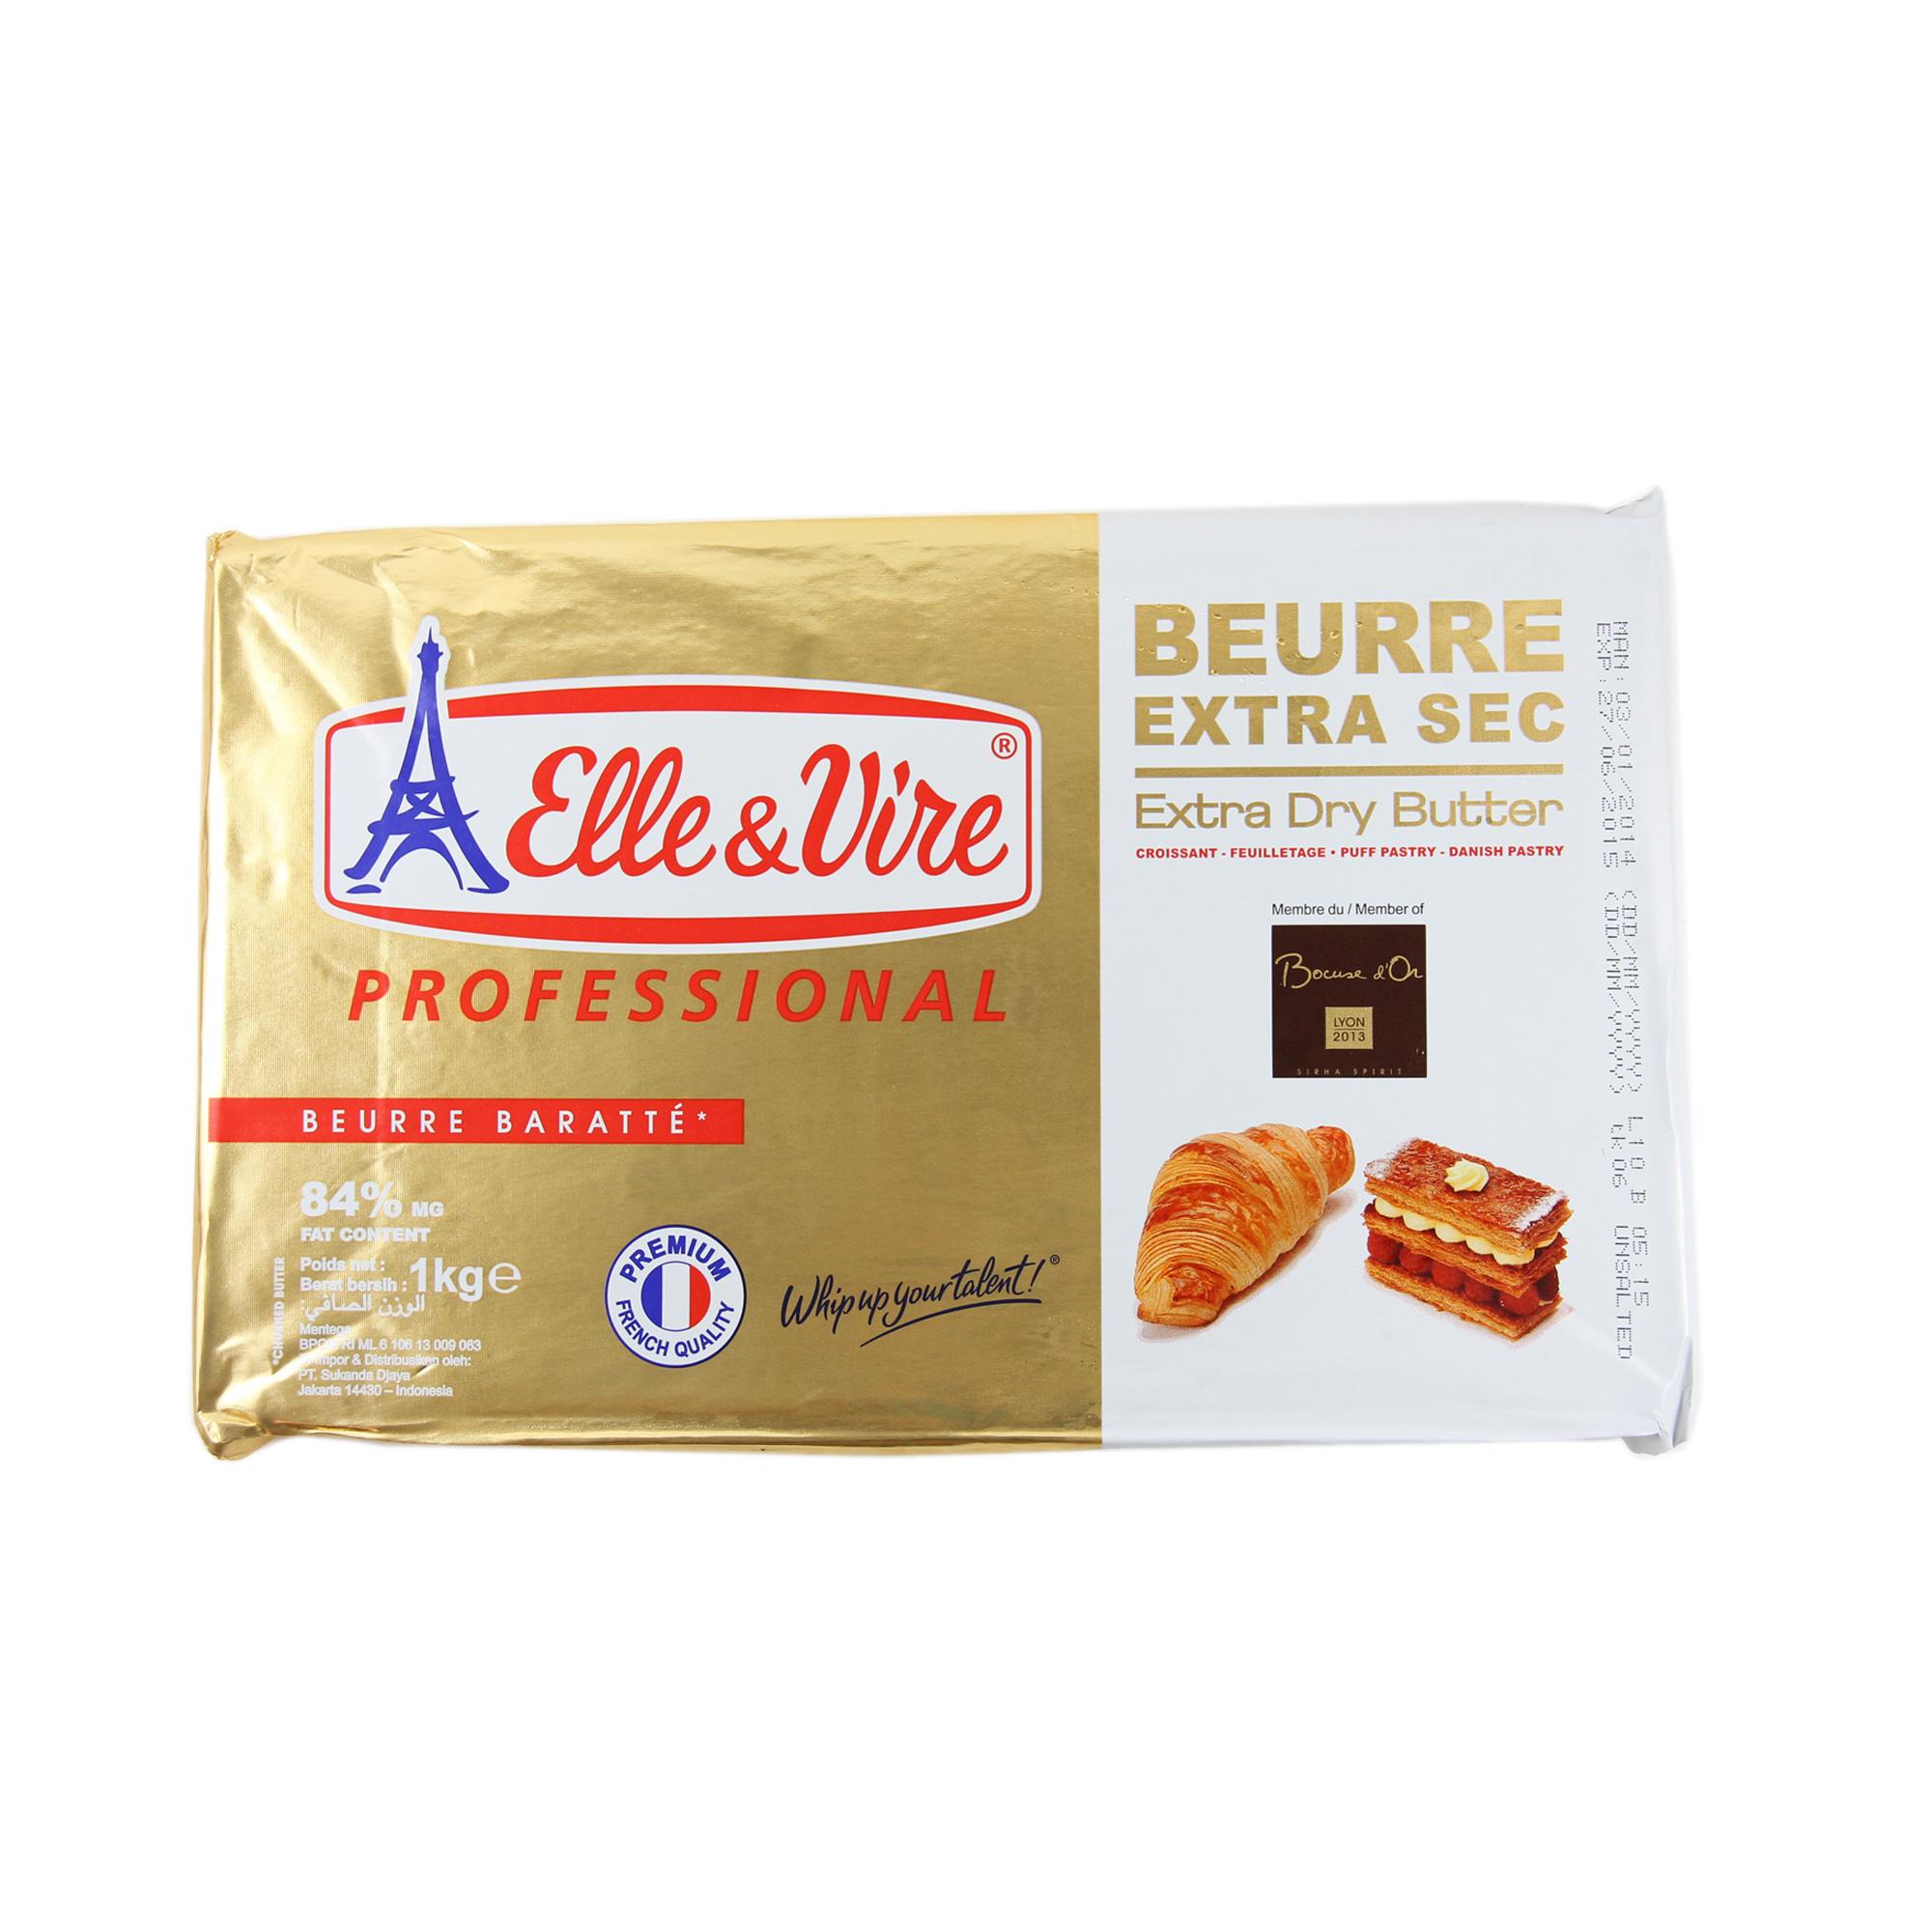 Elle&Vire เนยครัวซอง พาย ( Elle&Vire extra dry pastry butter) 1 kg (ไม่จัดส่งทางไปรษณีย์)